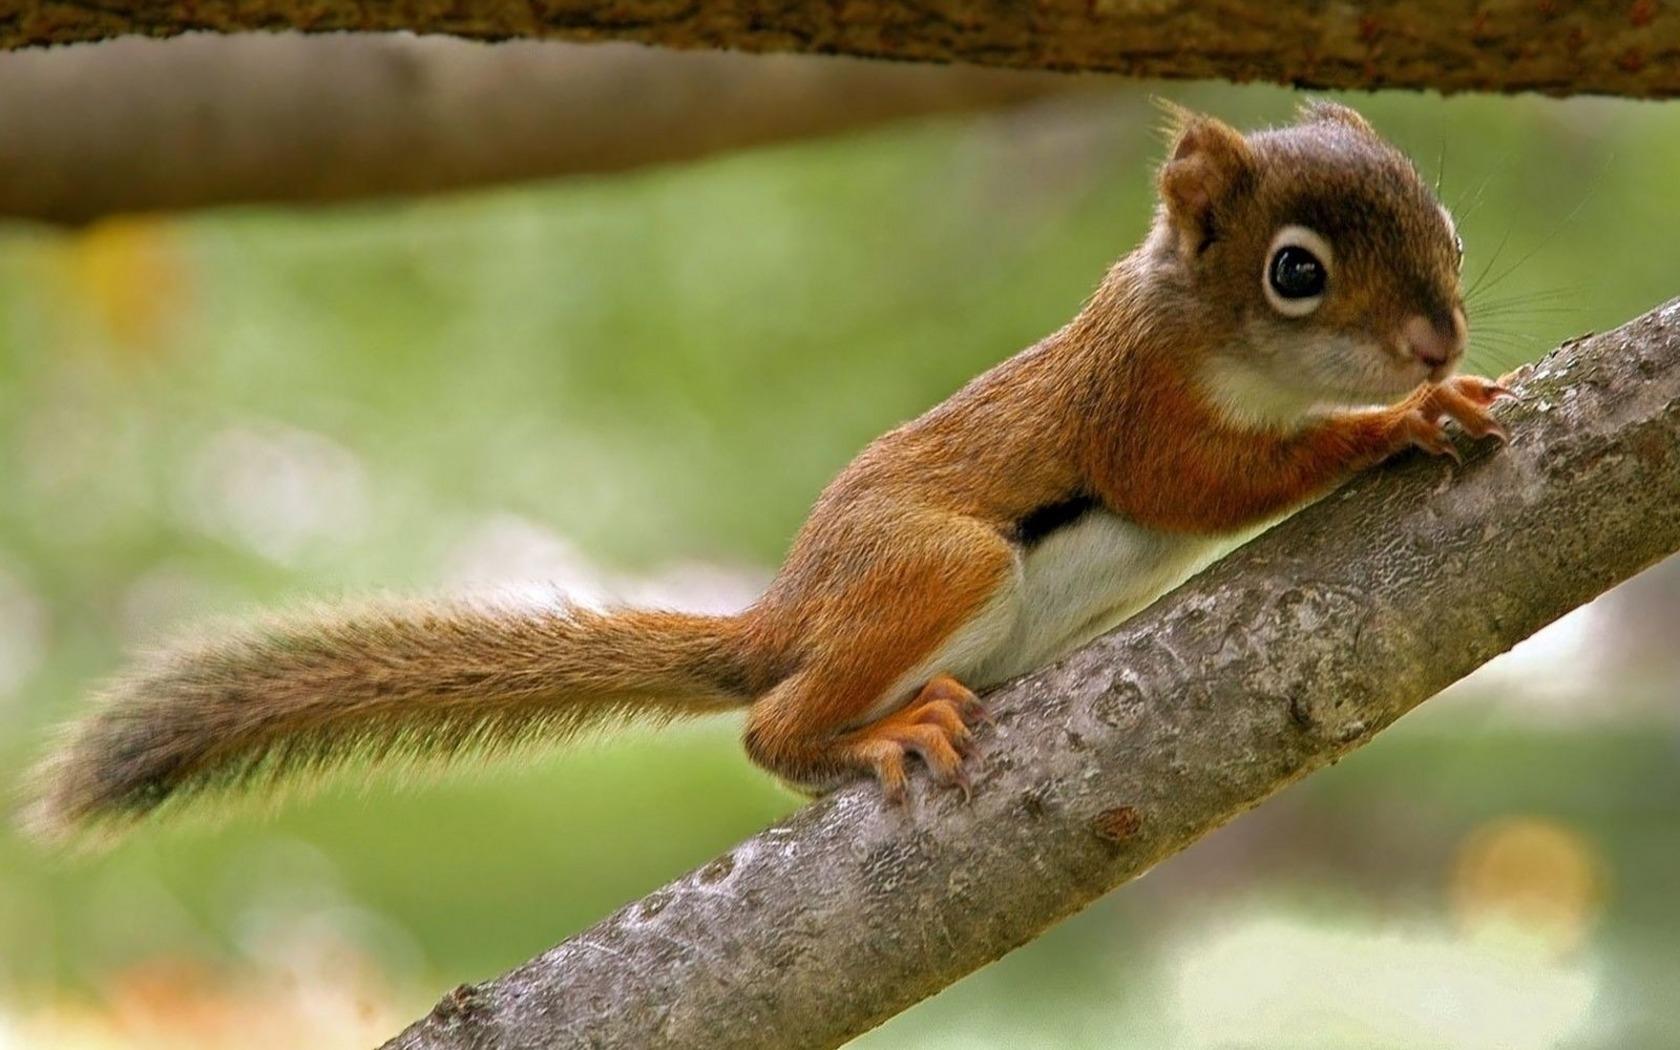 Chipmunk Small Squirrel Like HD Desktop Wallpaper | WallpaperCow.com